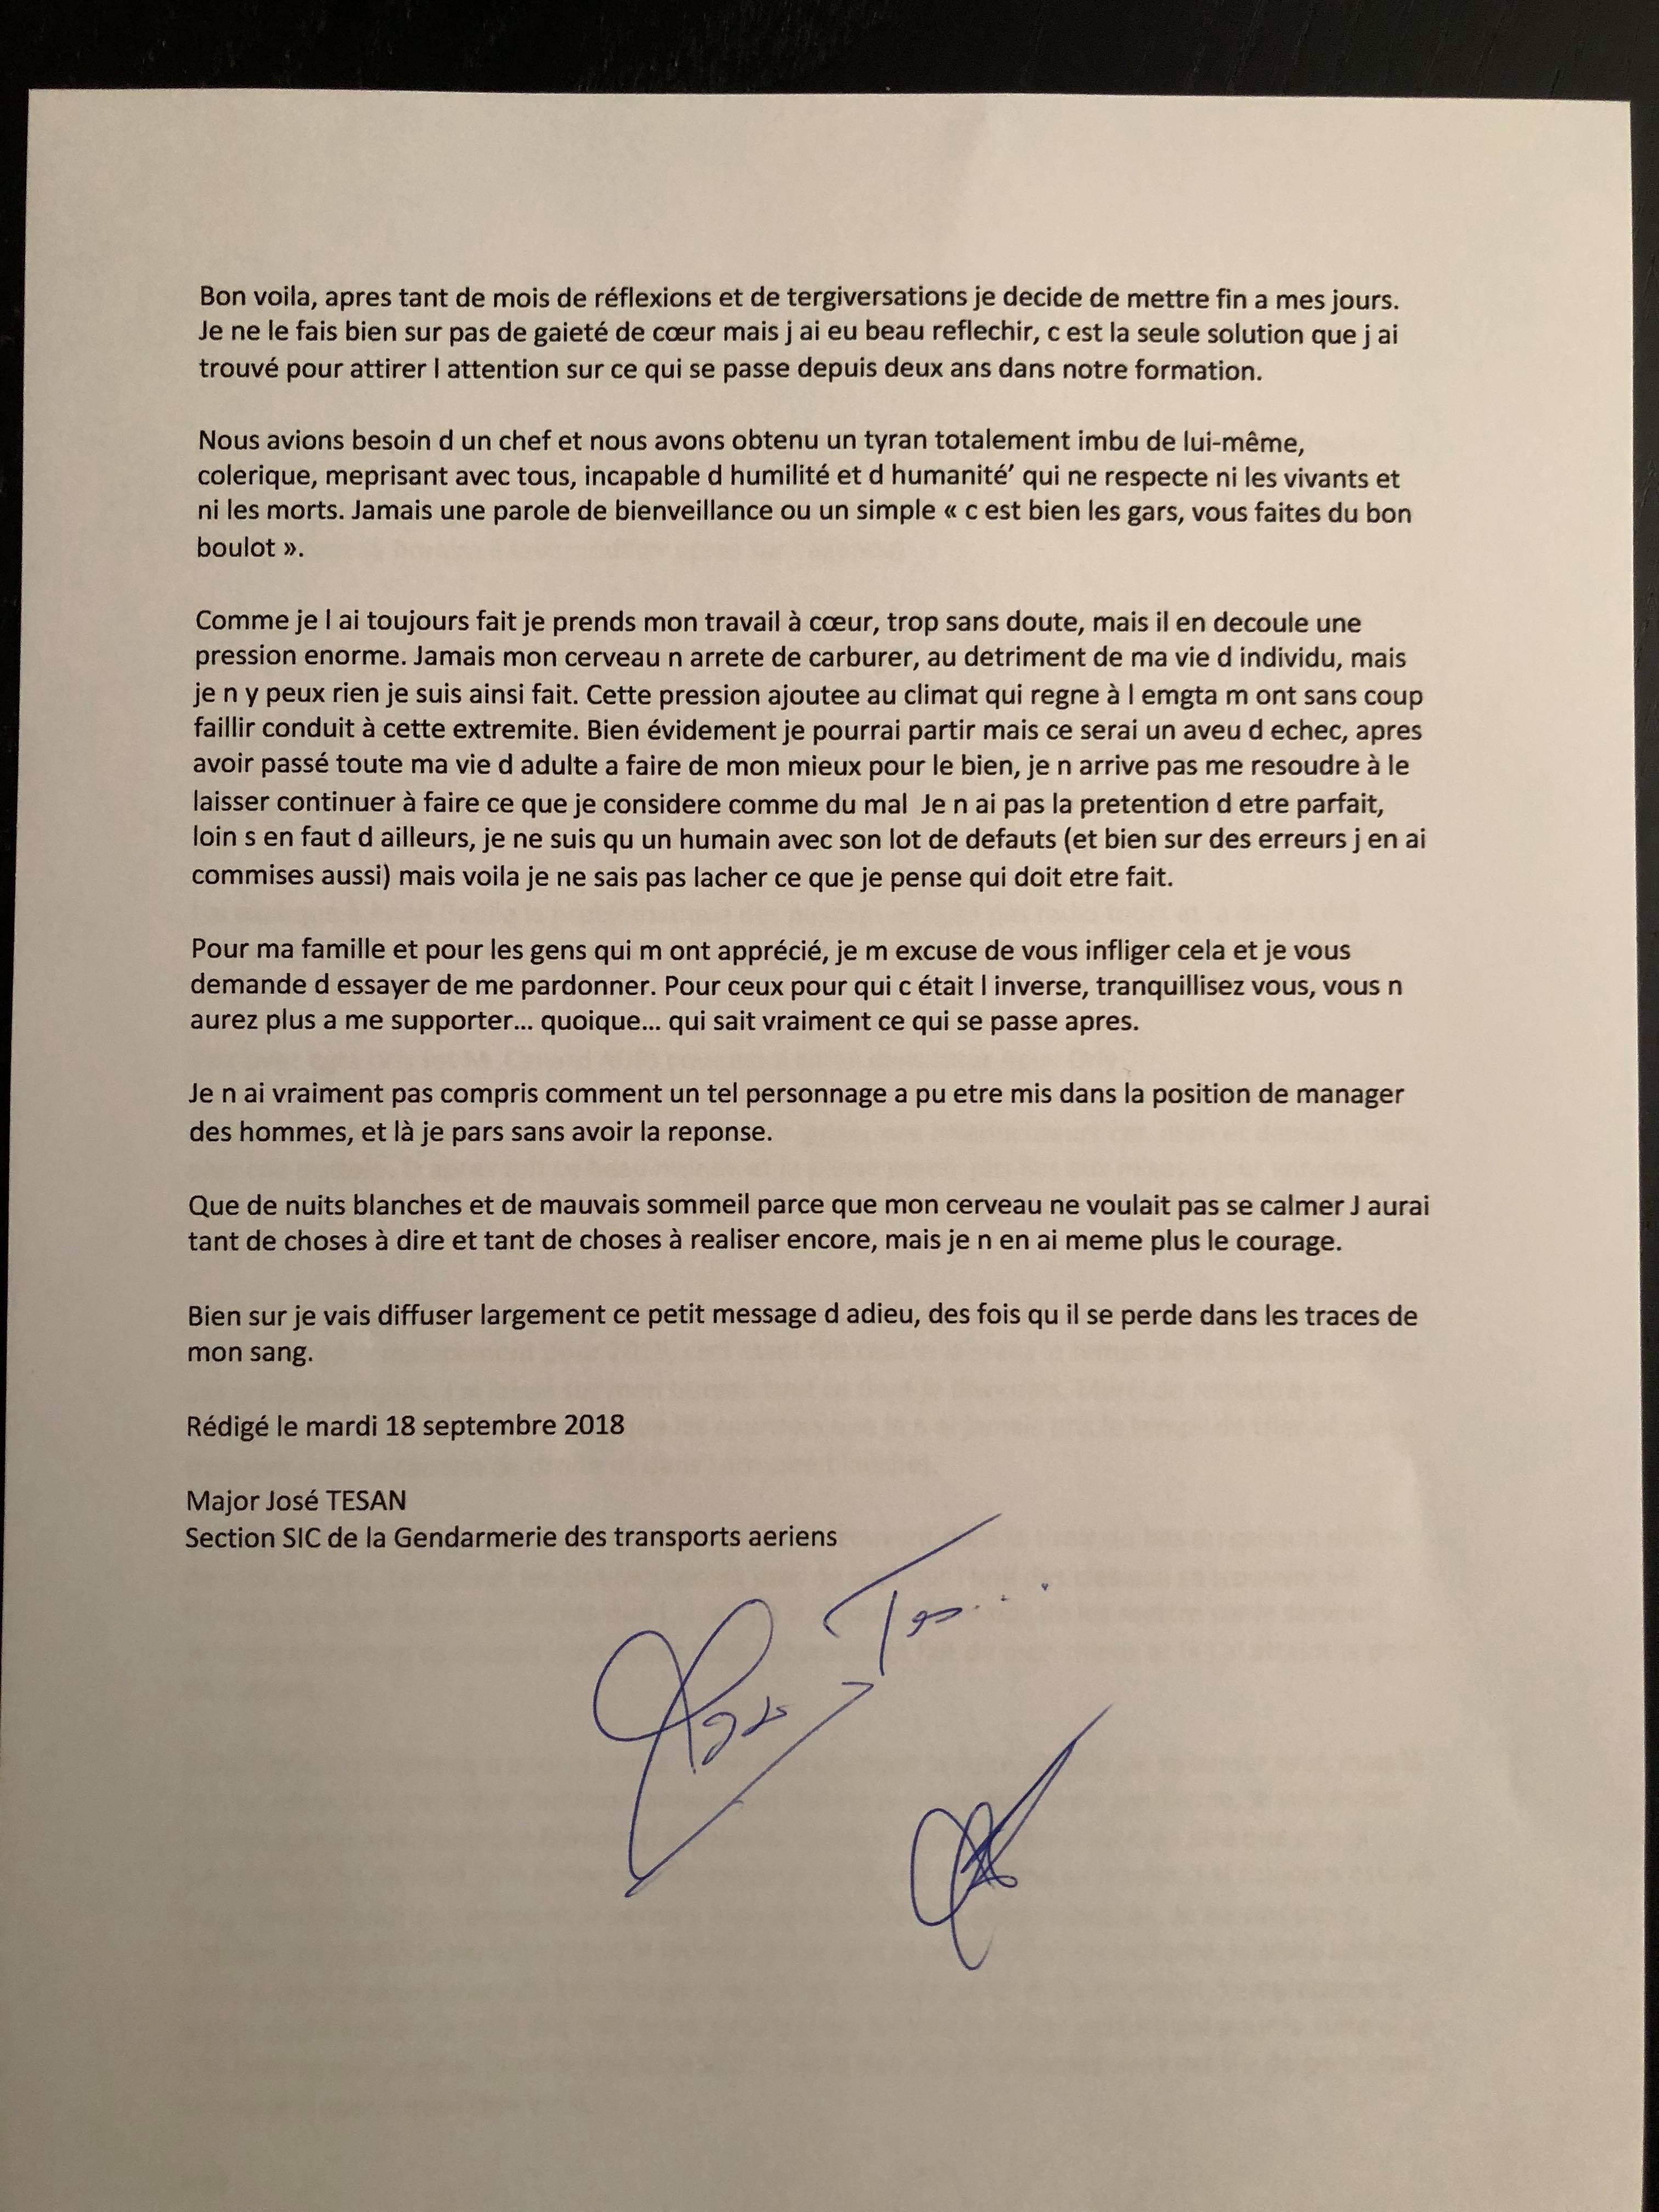 Suicide Gendarmerie : Lettre d'adieu du major José TESAN